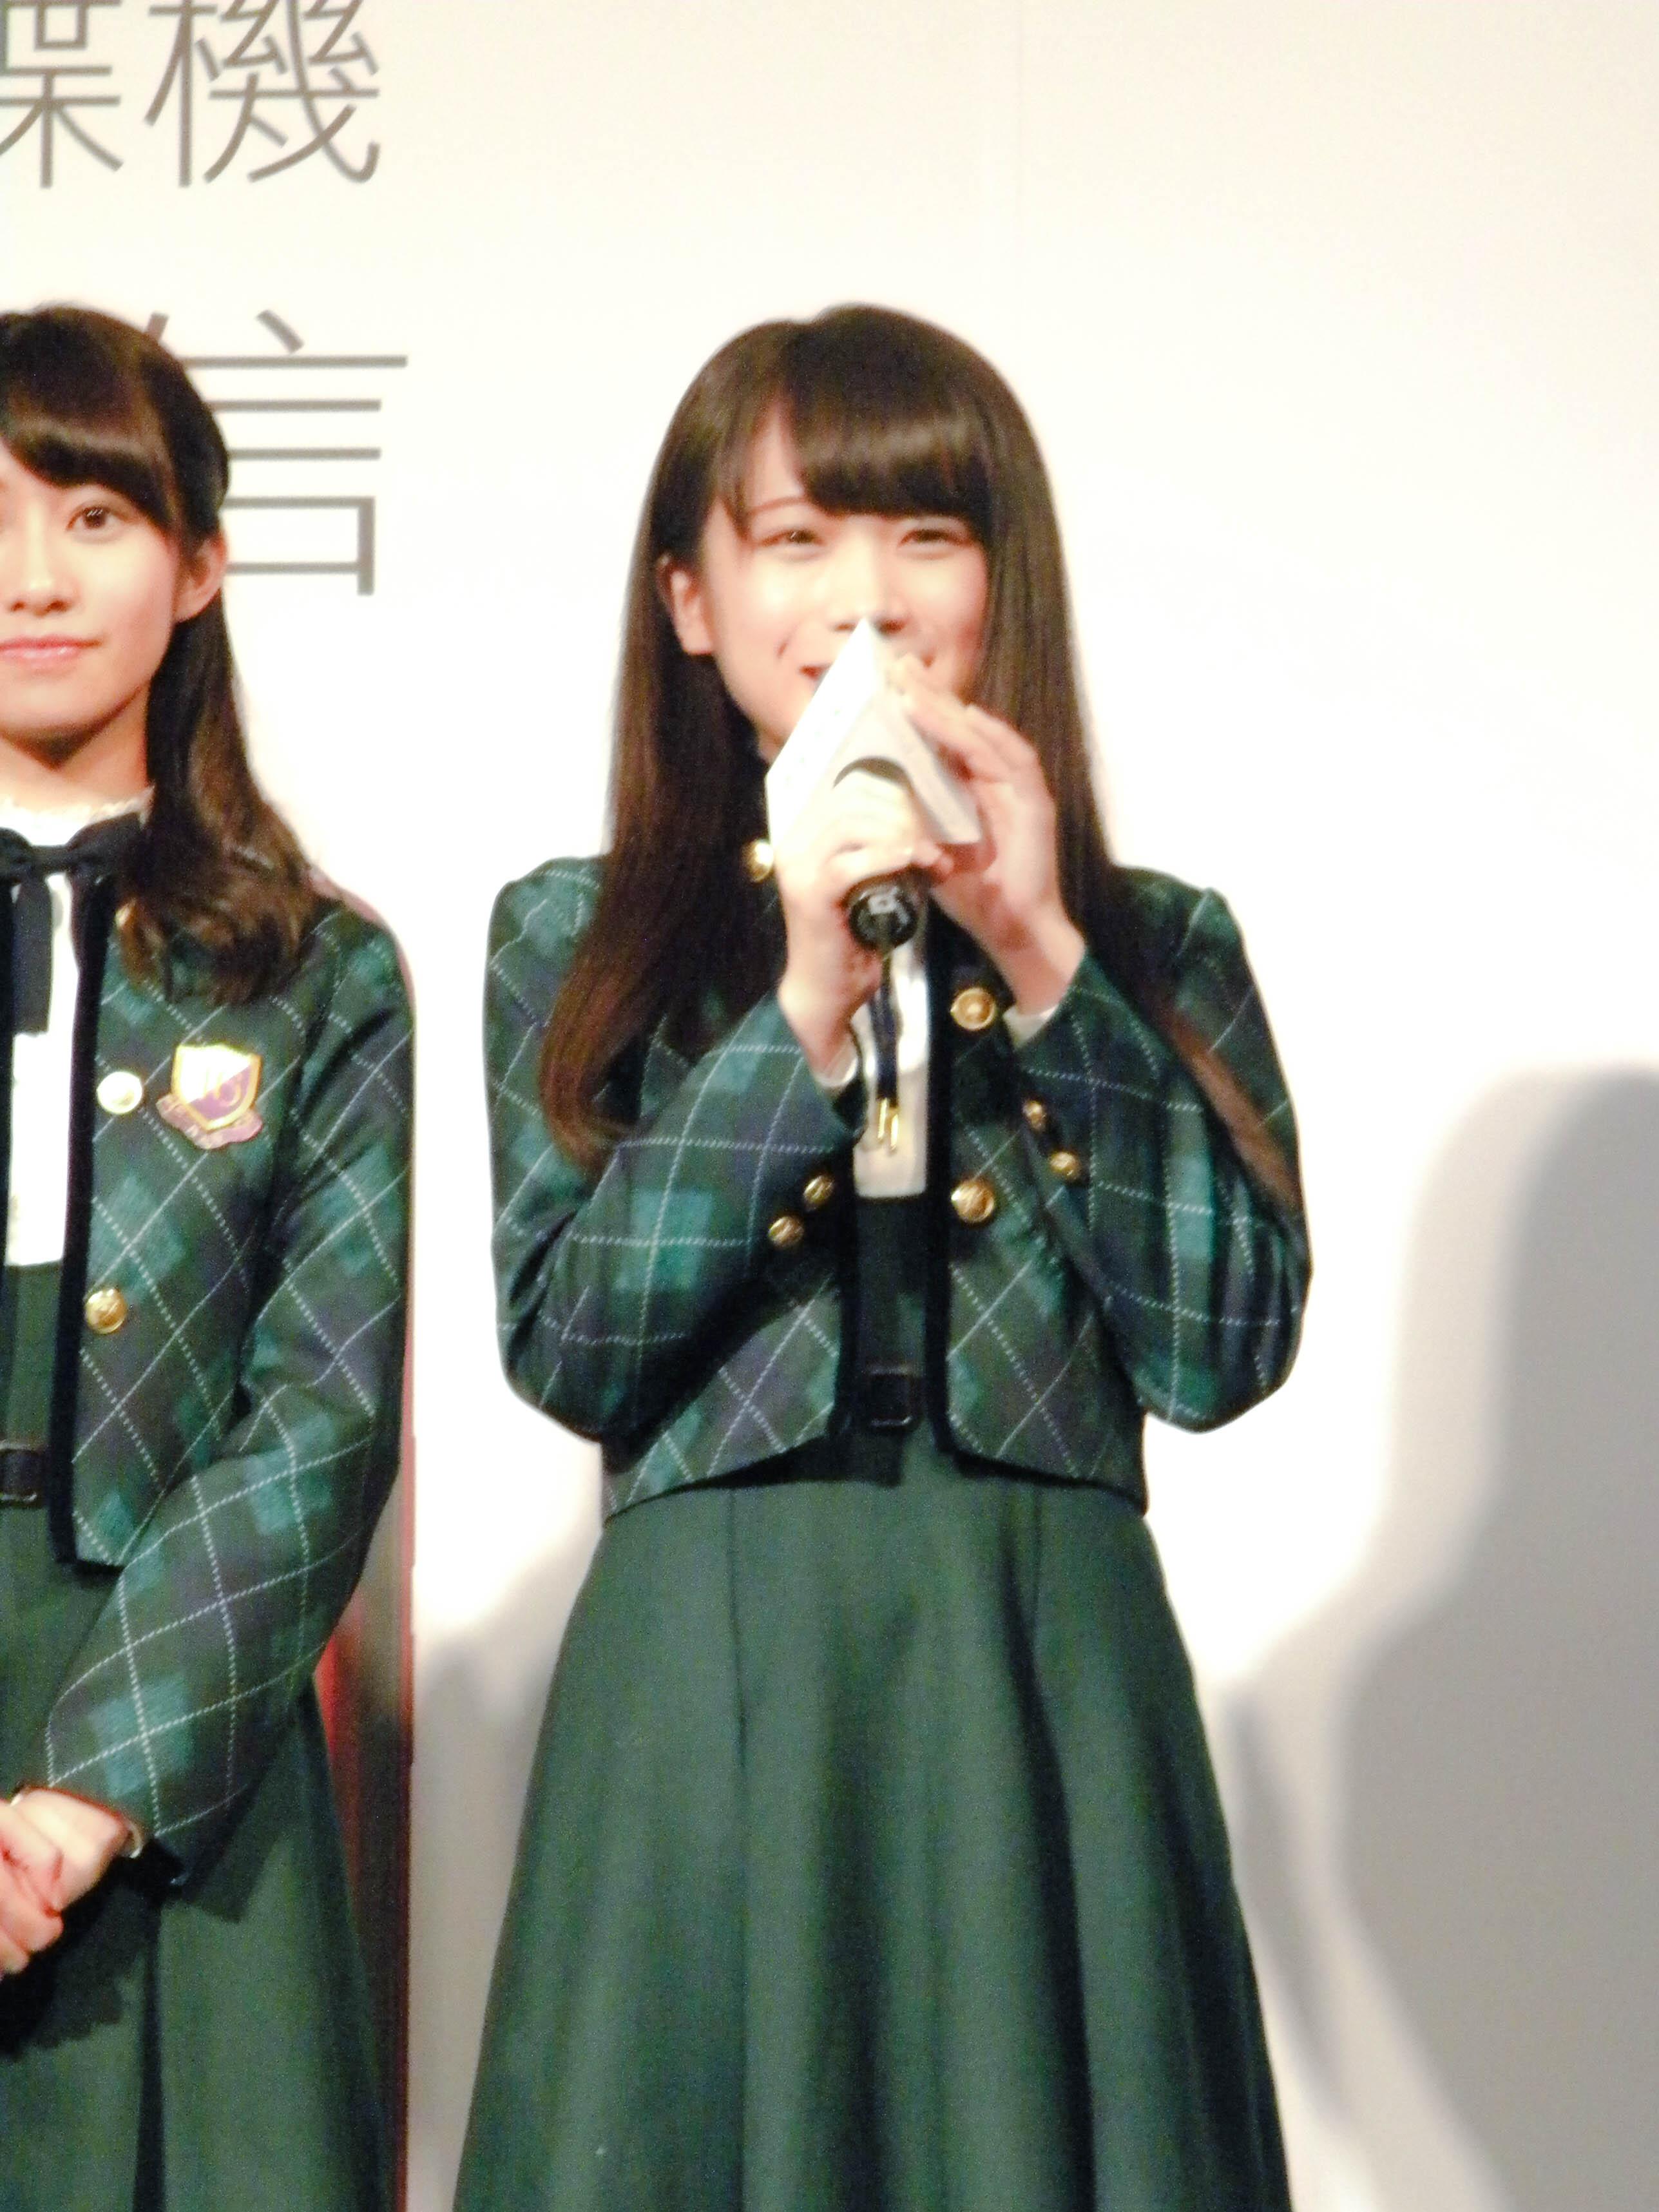 File:Manatsu Akimoto-02 Nogizaka46 HTC event 20140903 jpg